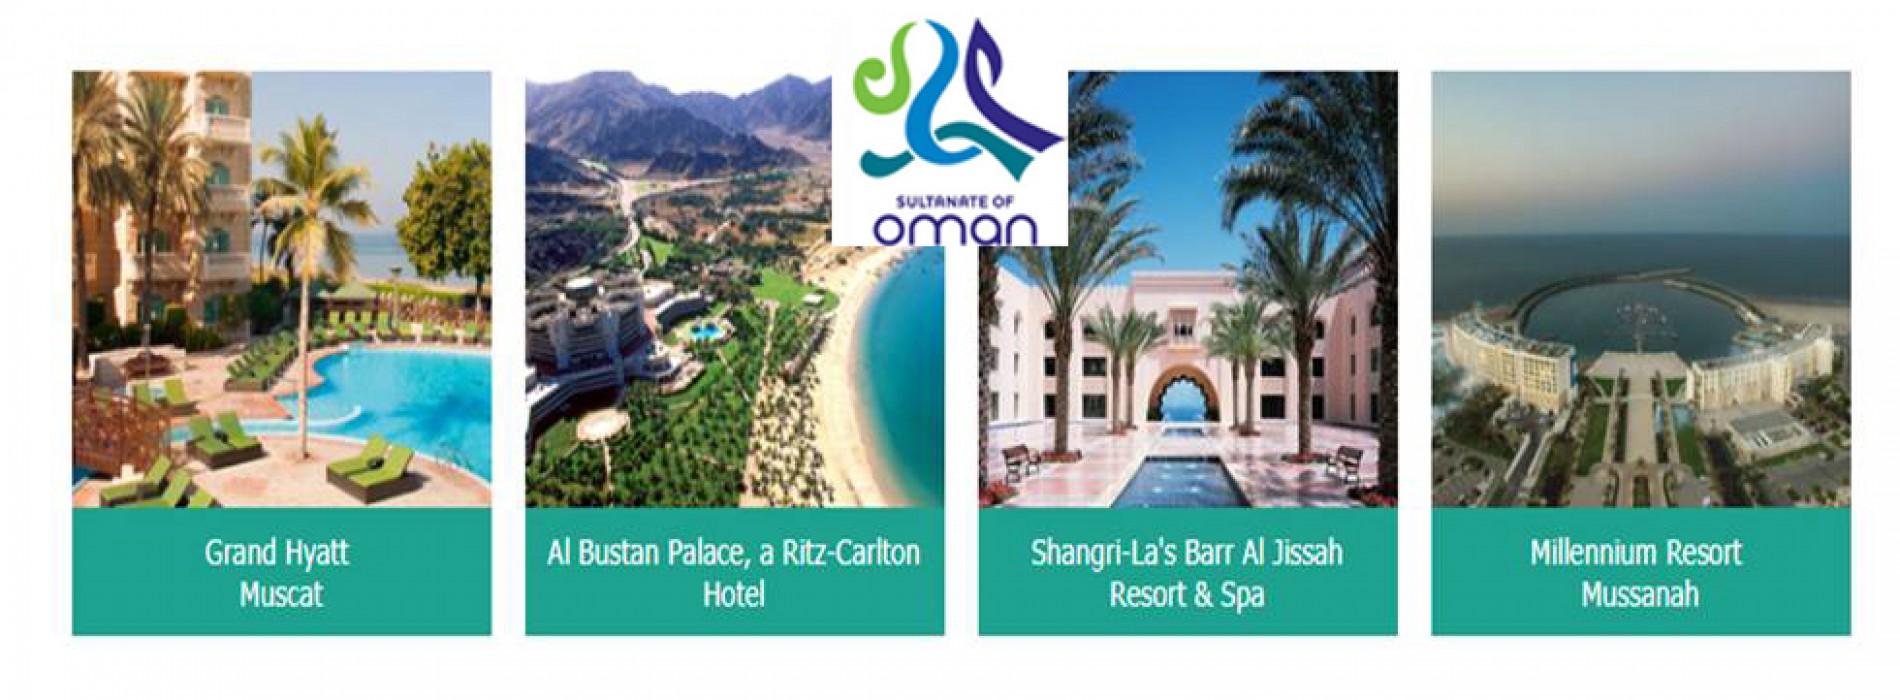 'Oman' for destination wedding and celebrations